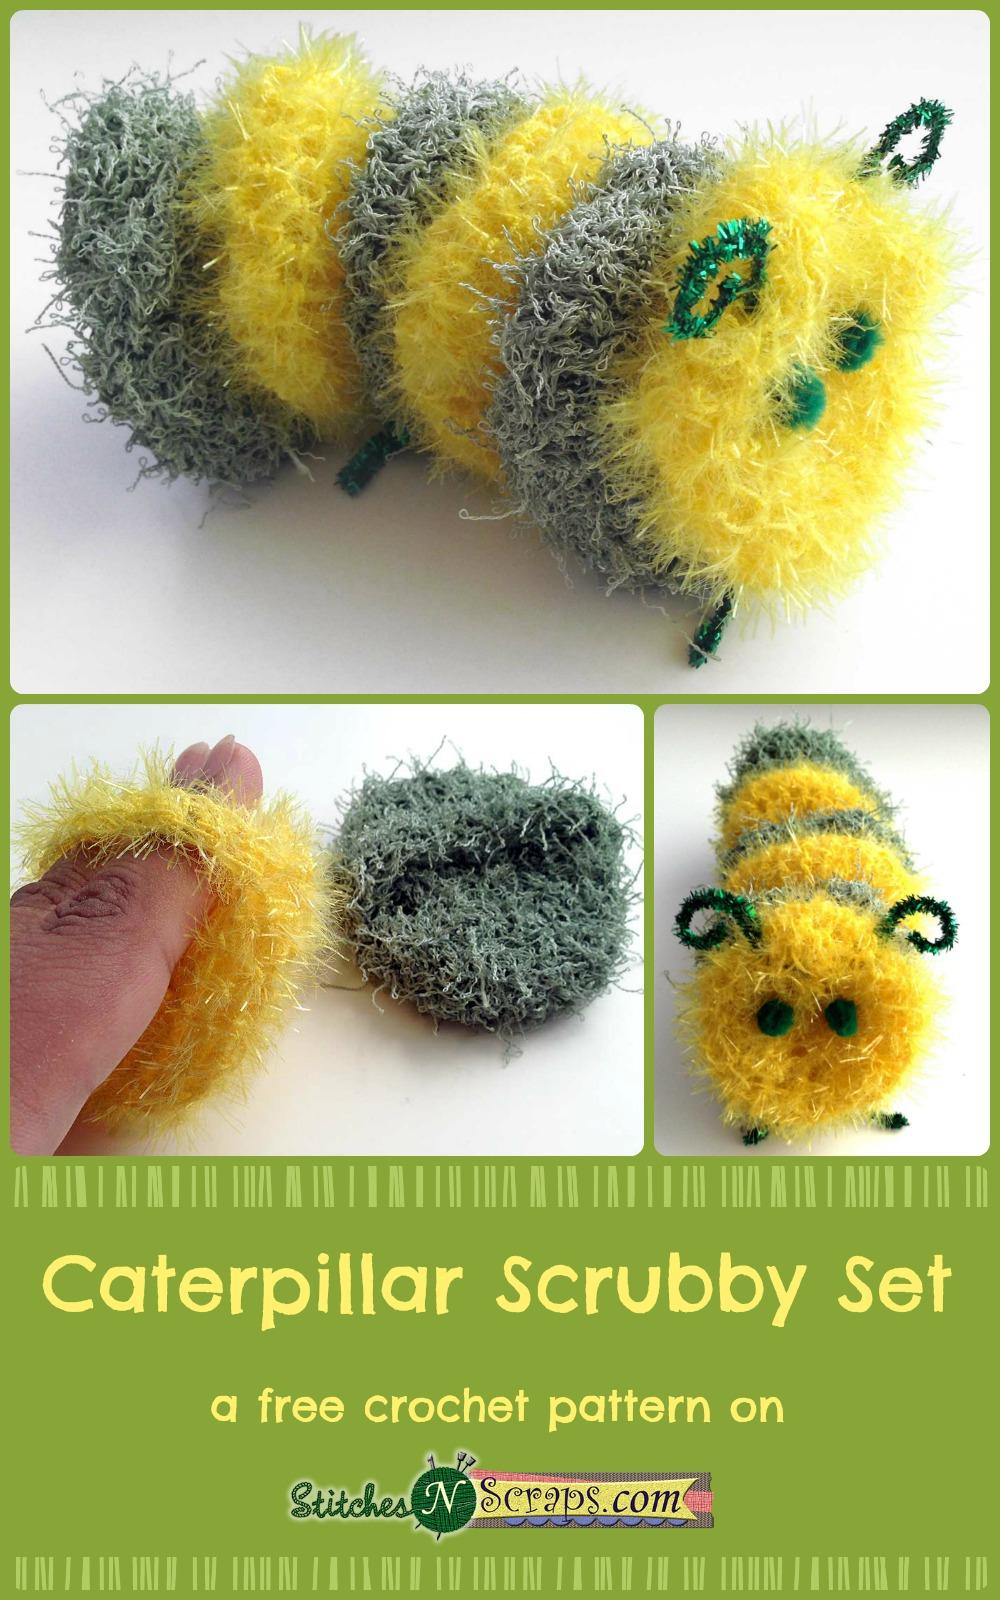 Free Pattern Caterpillar Scrubby Set Stitches N Scraps